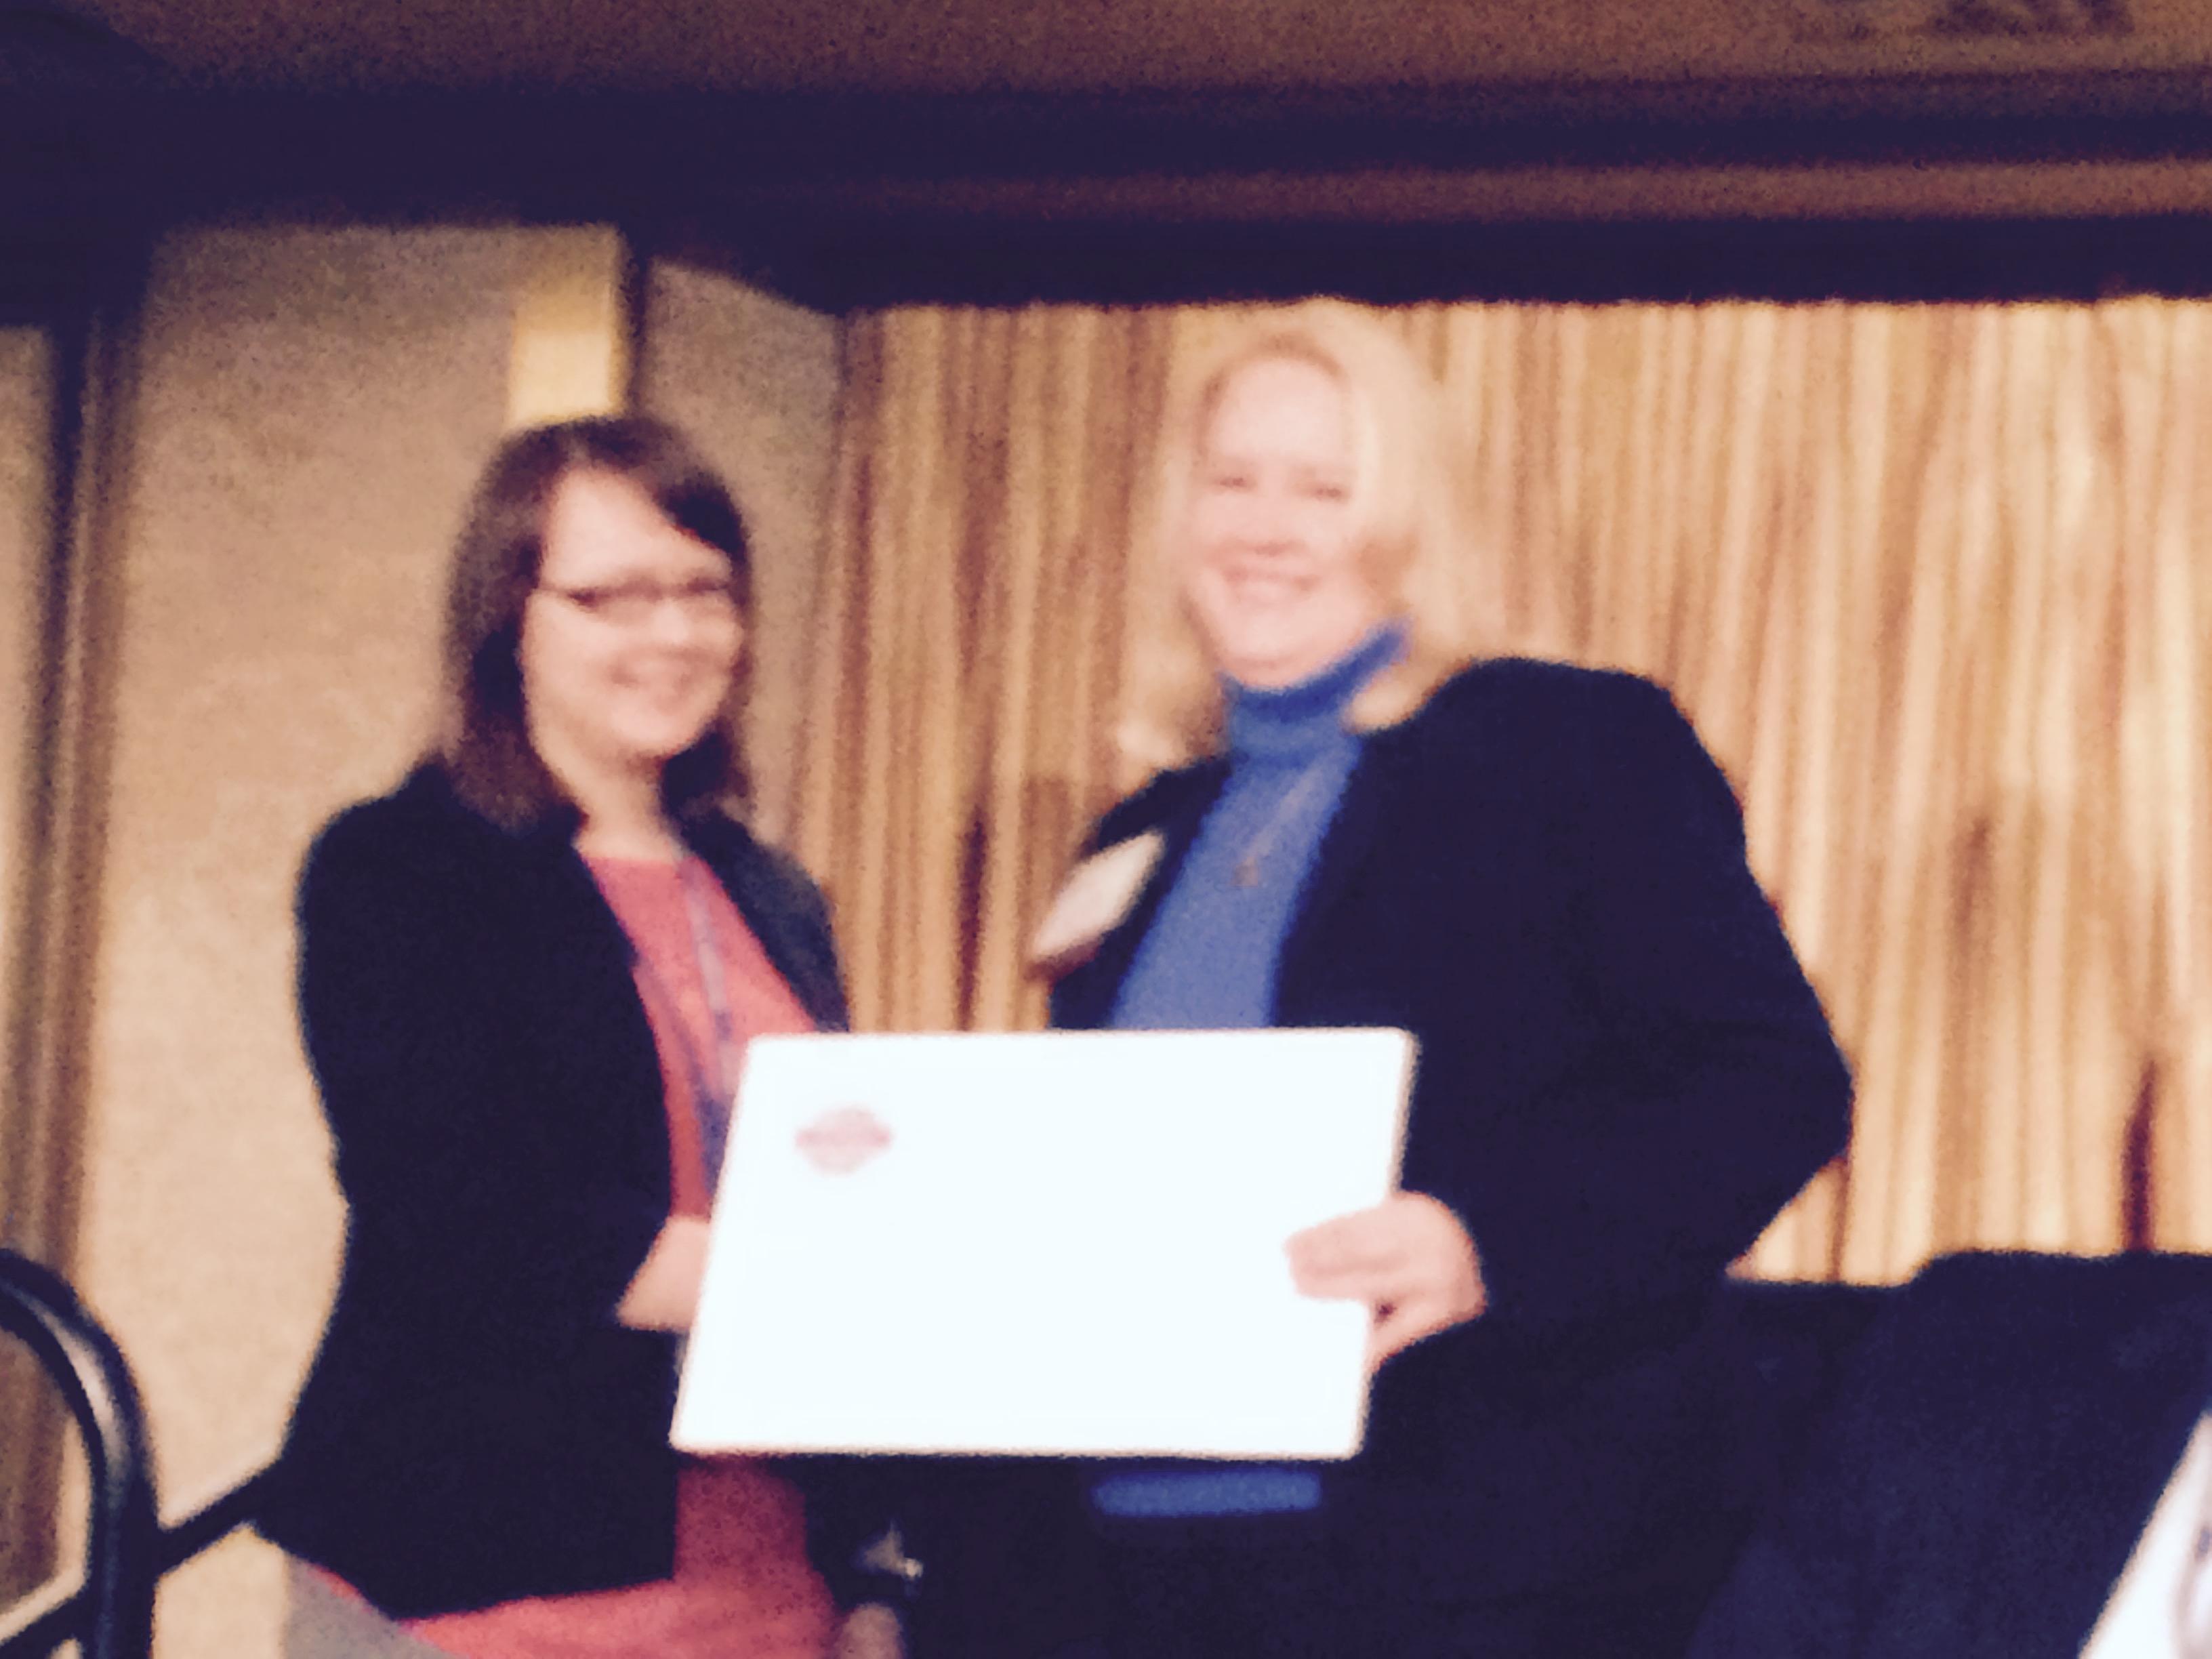 2015 SBW scholarship recipient Alicia Kilian with President Lee Sanders at ATBI Breakfast.